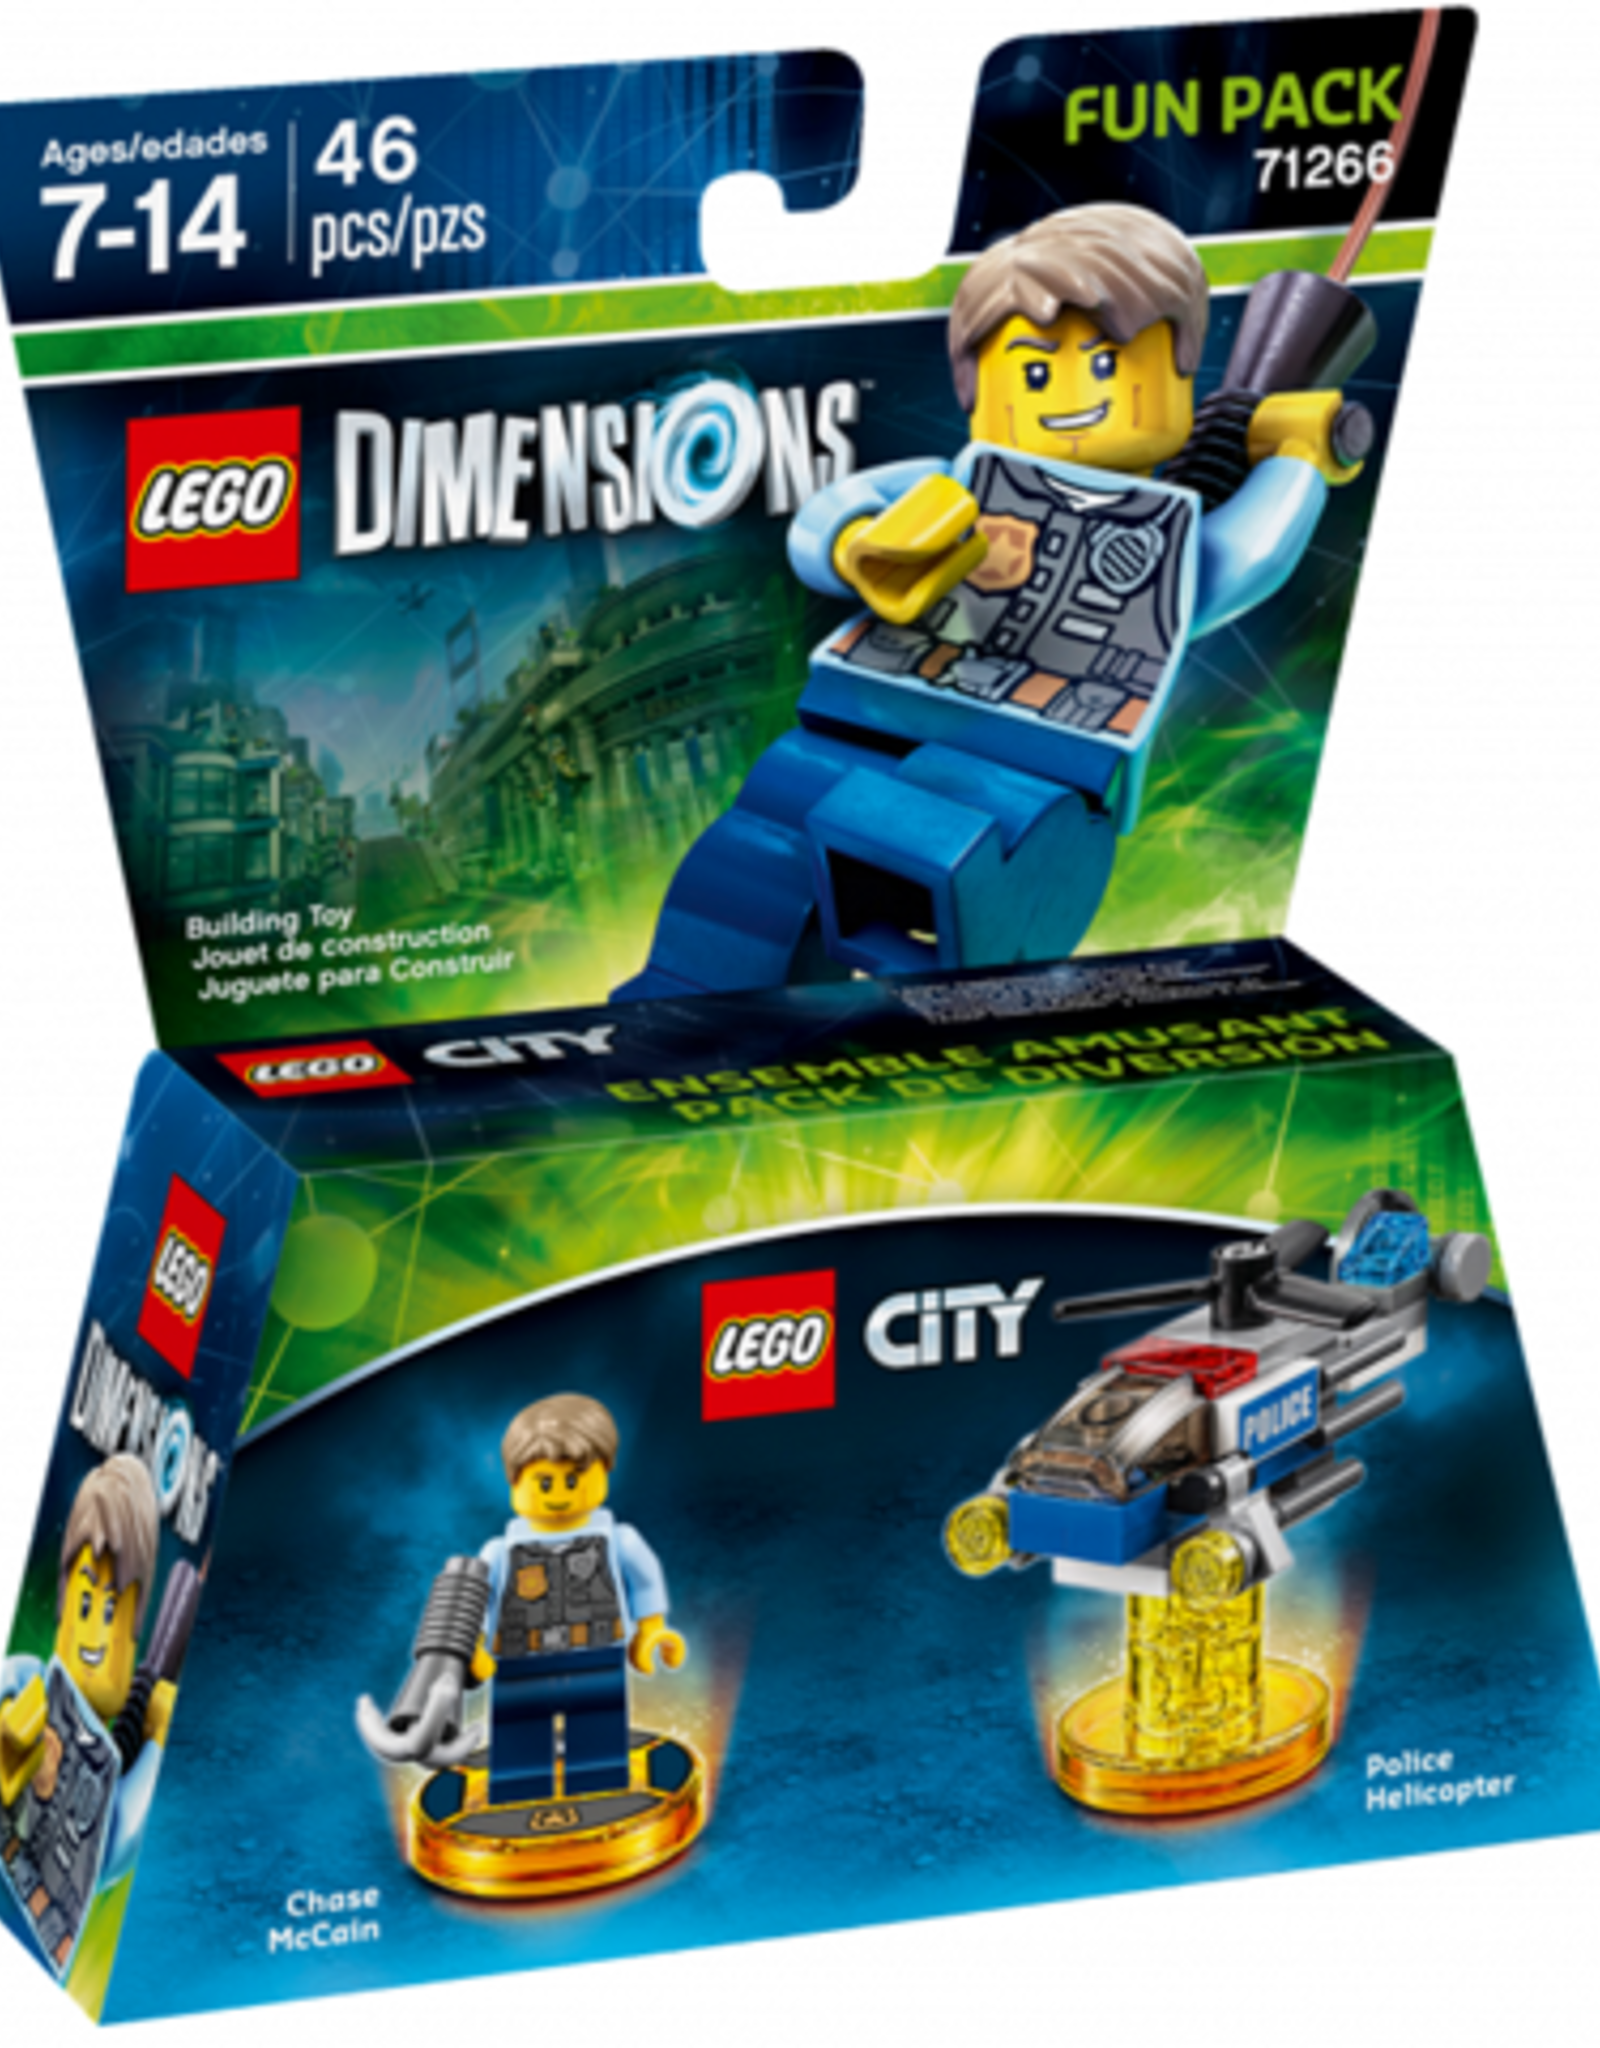 LEGO LEGO 71266 Fun Pack - City Dimensions